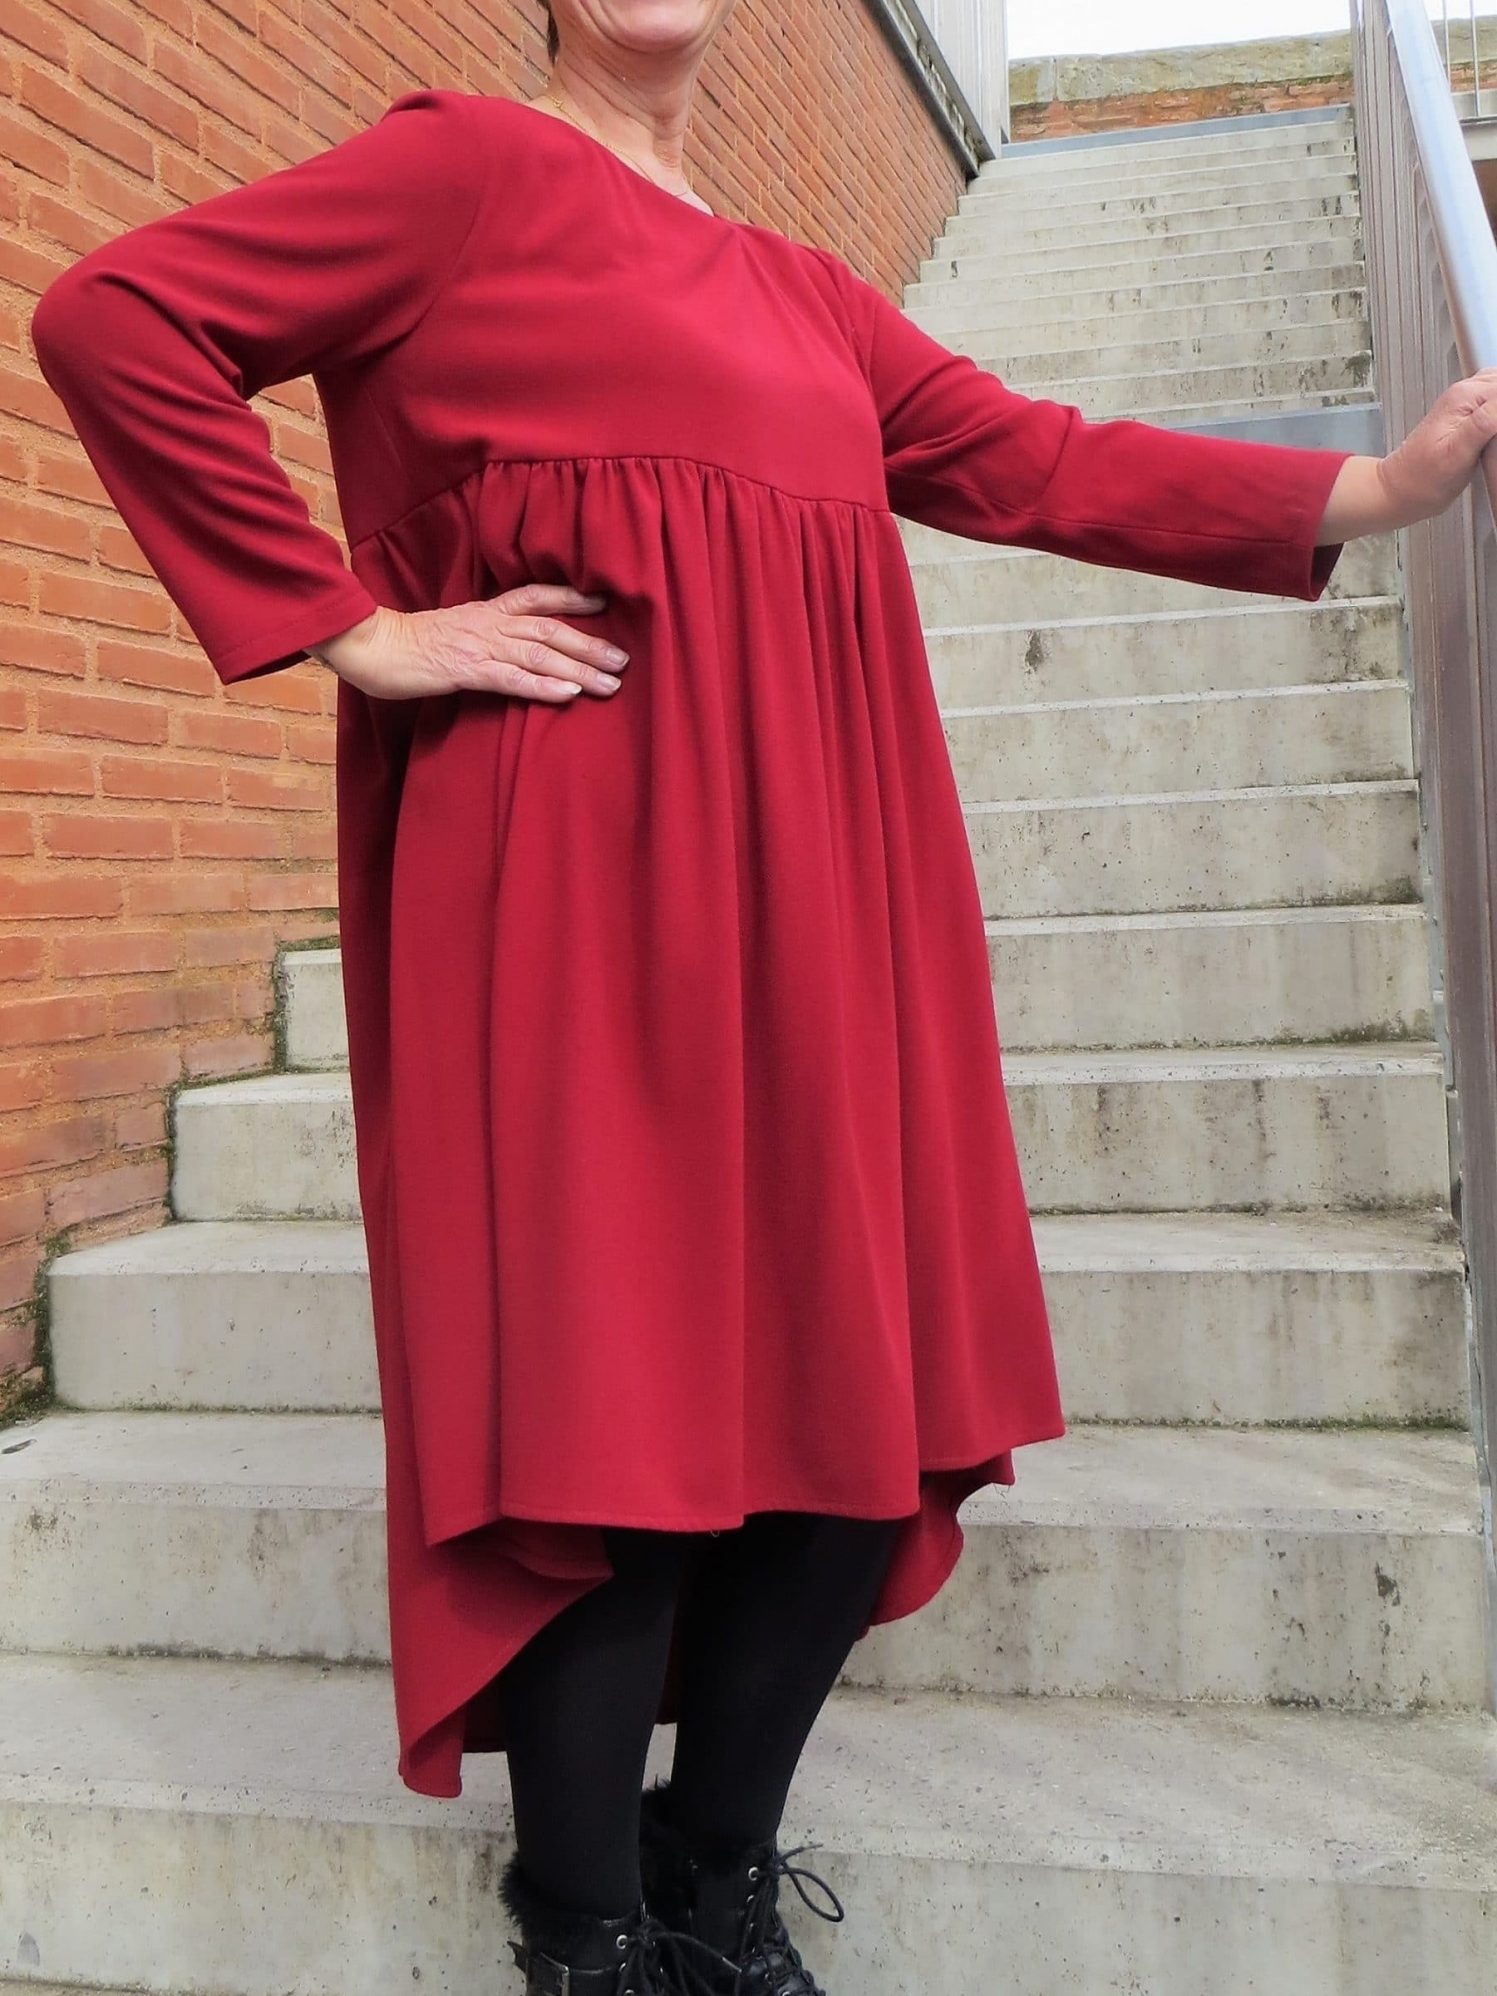 La robe foncée avec manches